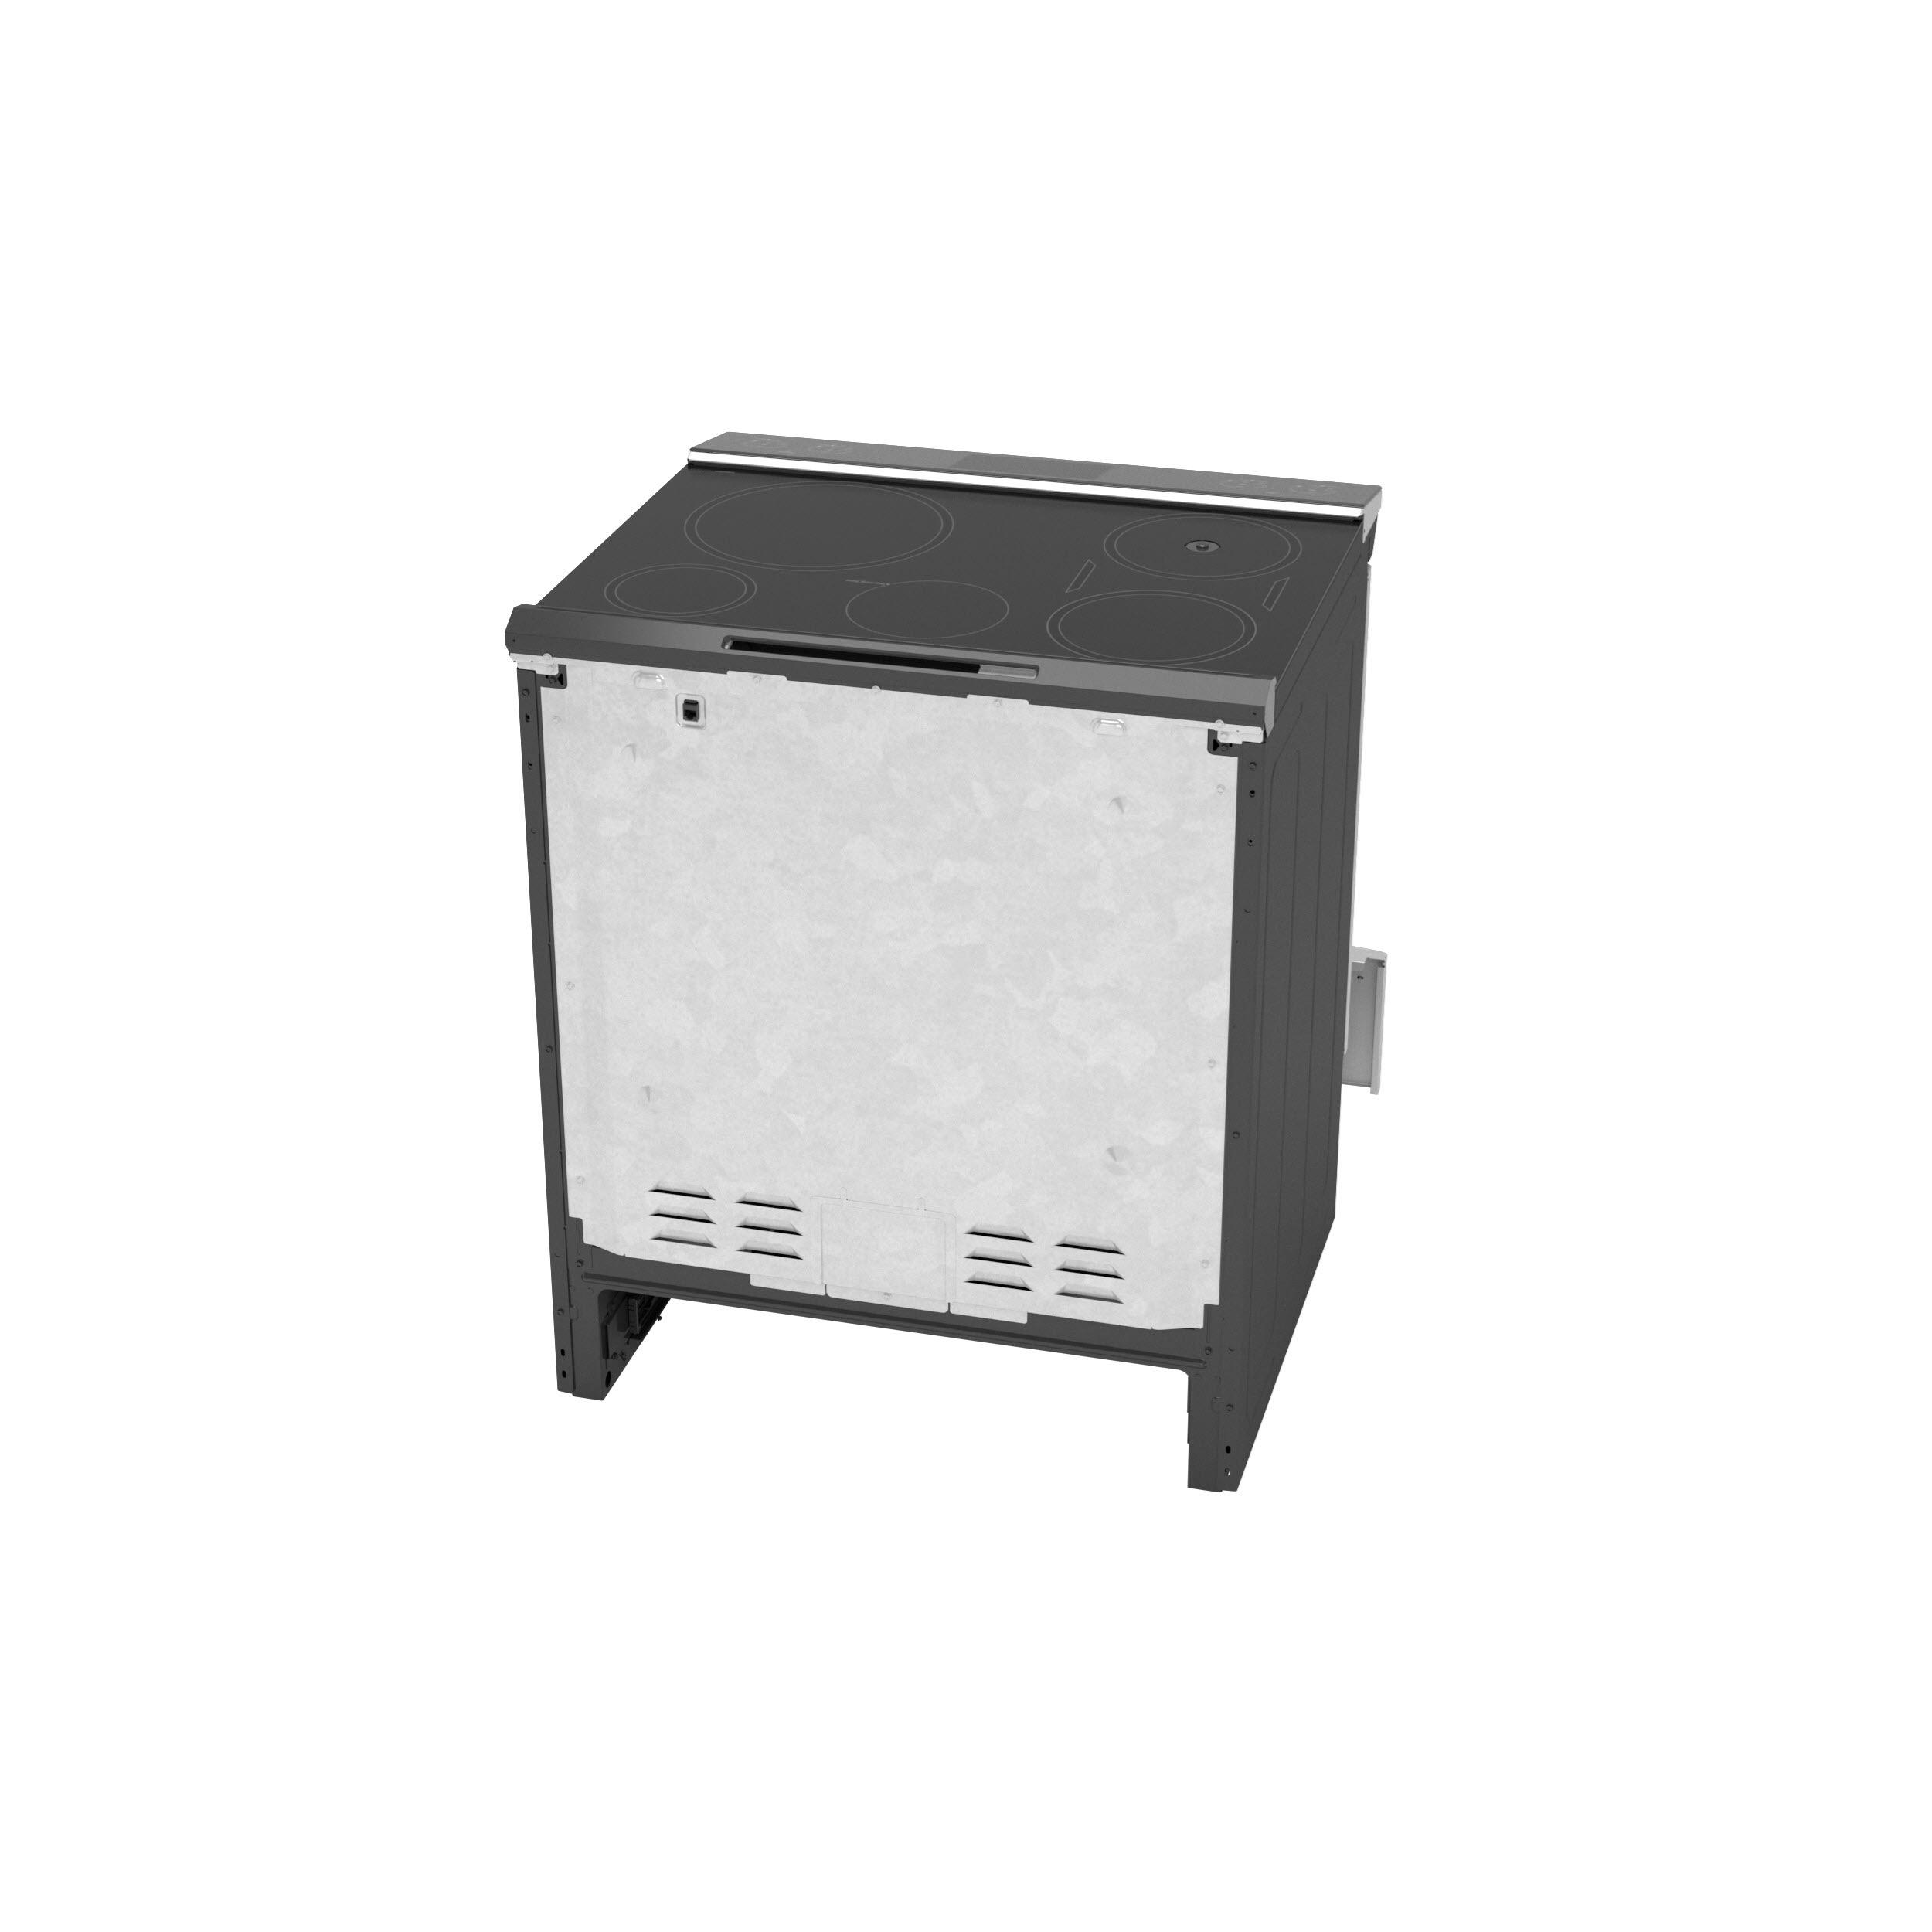 "Model: PHS93XYPFS | GE Profile GE Profile™ 30"" Smart Slide-In Front-Control Induction Fingerprint Resistant Range with In Oven Camera"